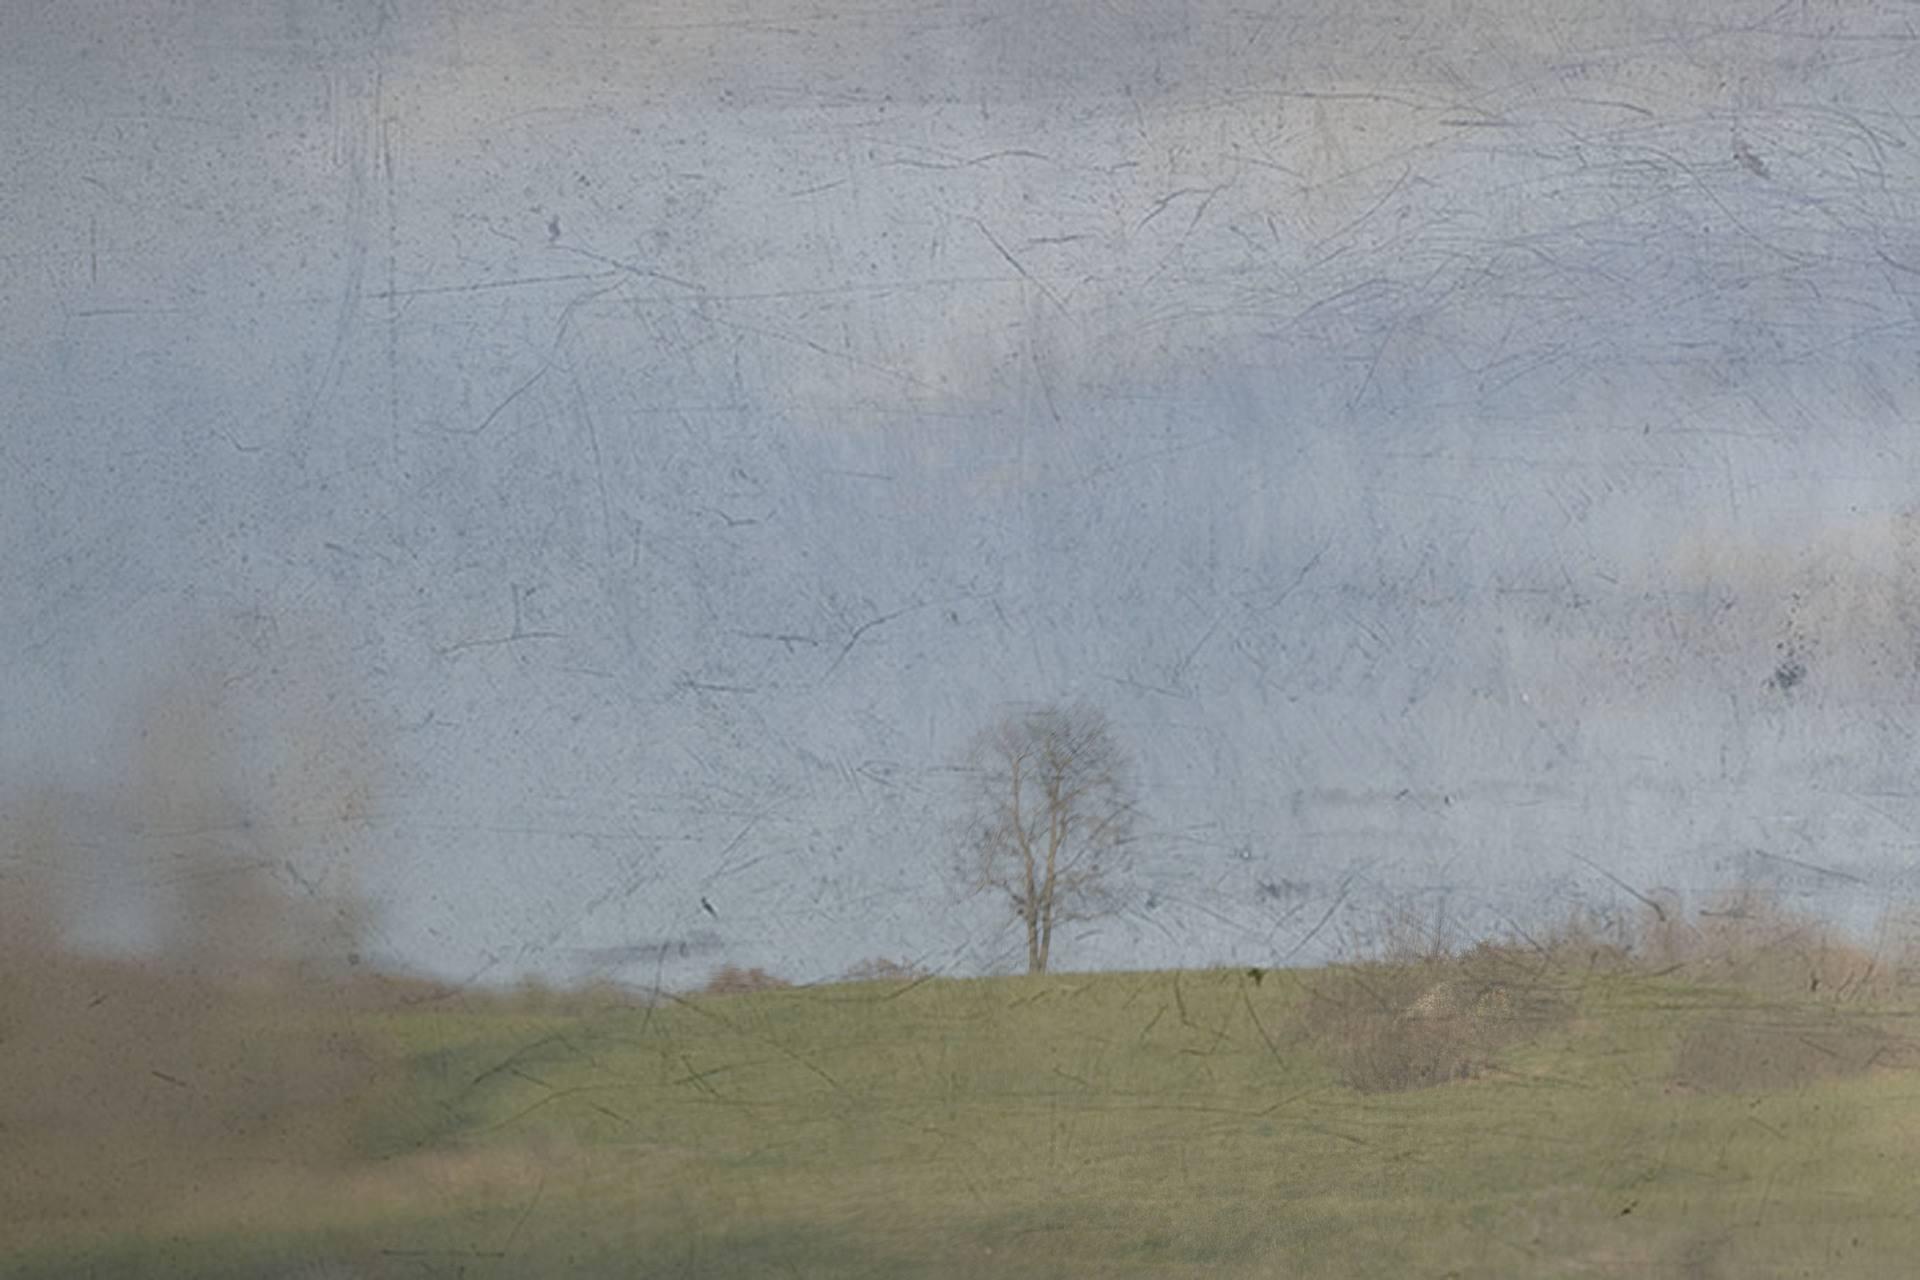 Day 137: Lone Tree Overlays